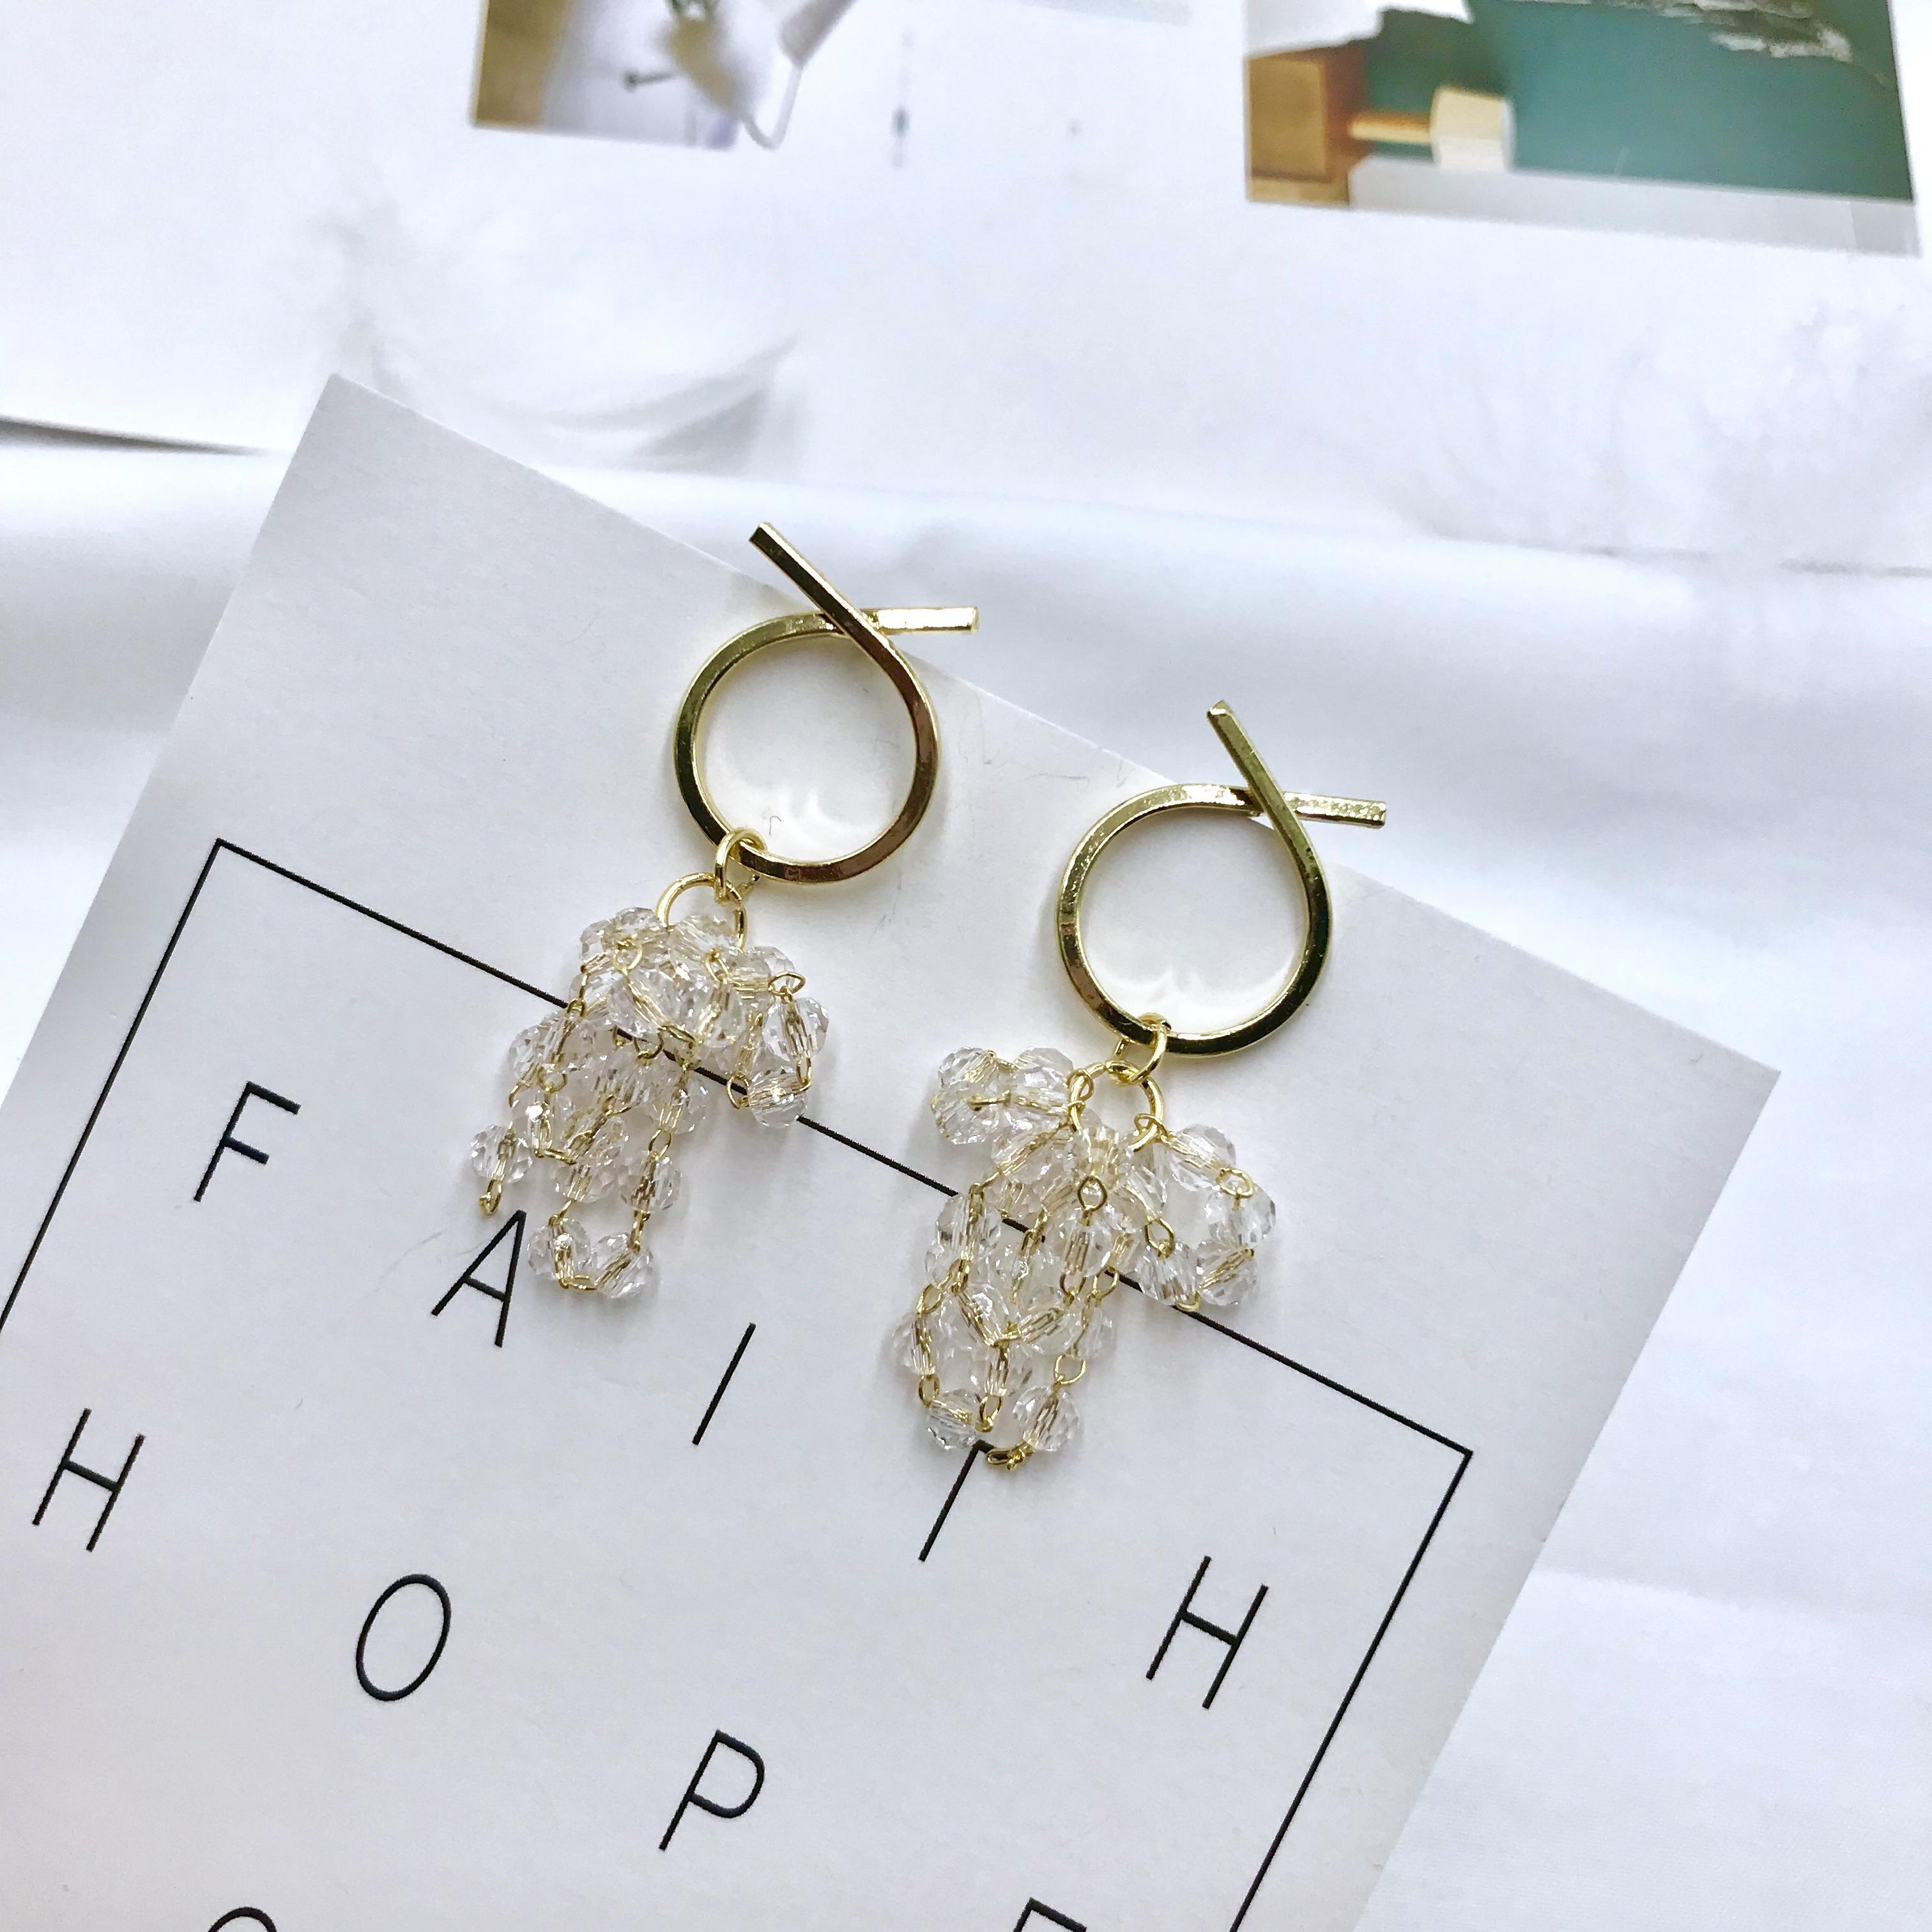 S925银针多层水晶缠绕流苏耳环韩国时尚气质网红金属圈圈耳钉新款